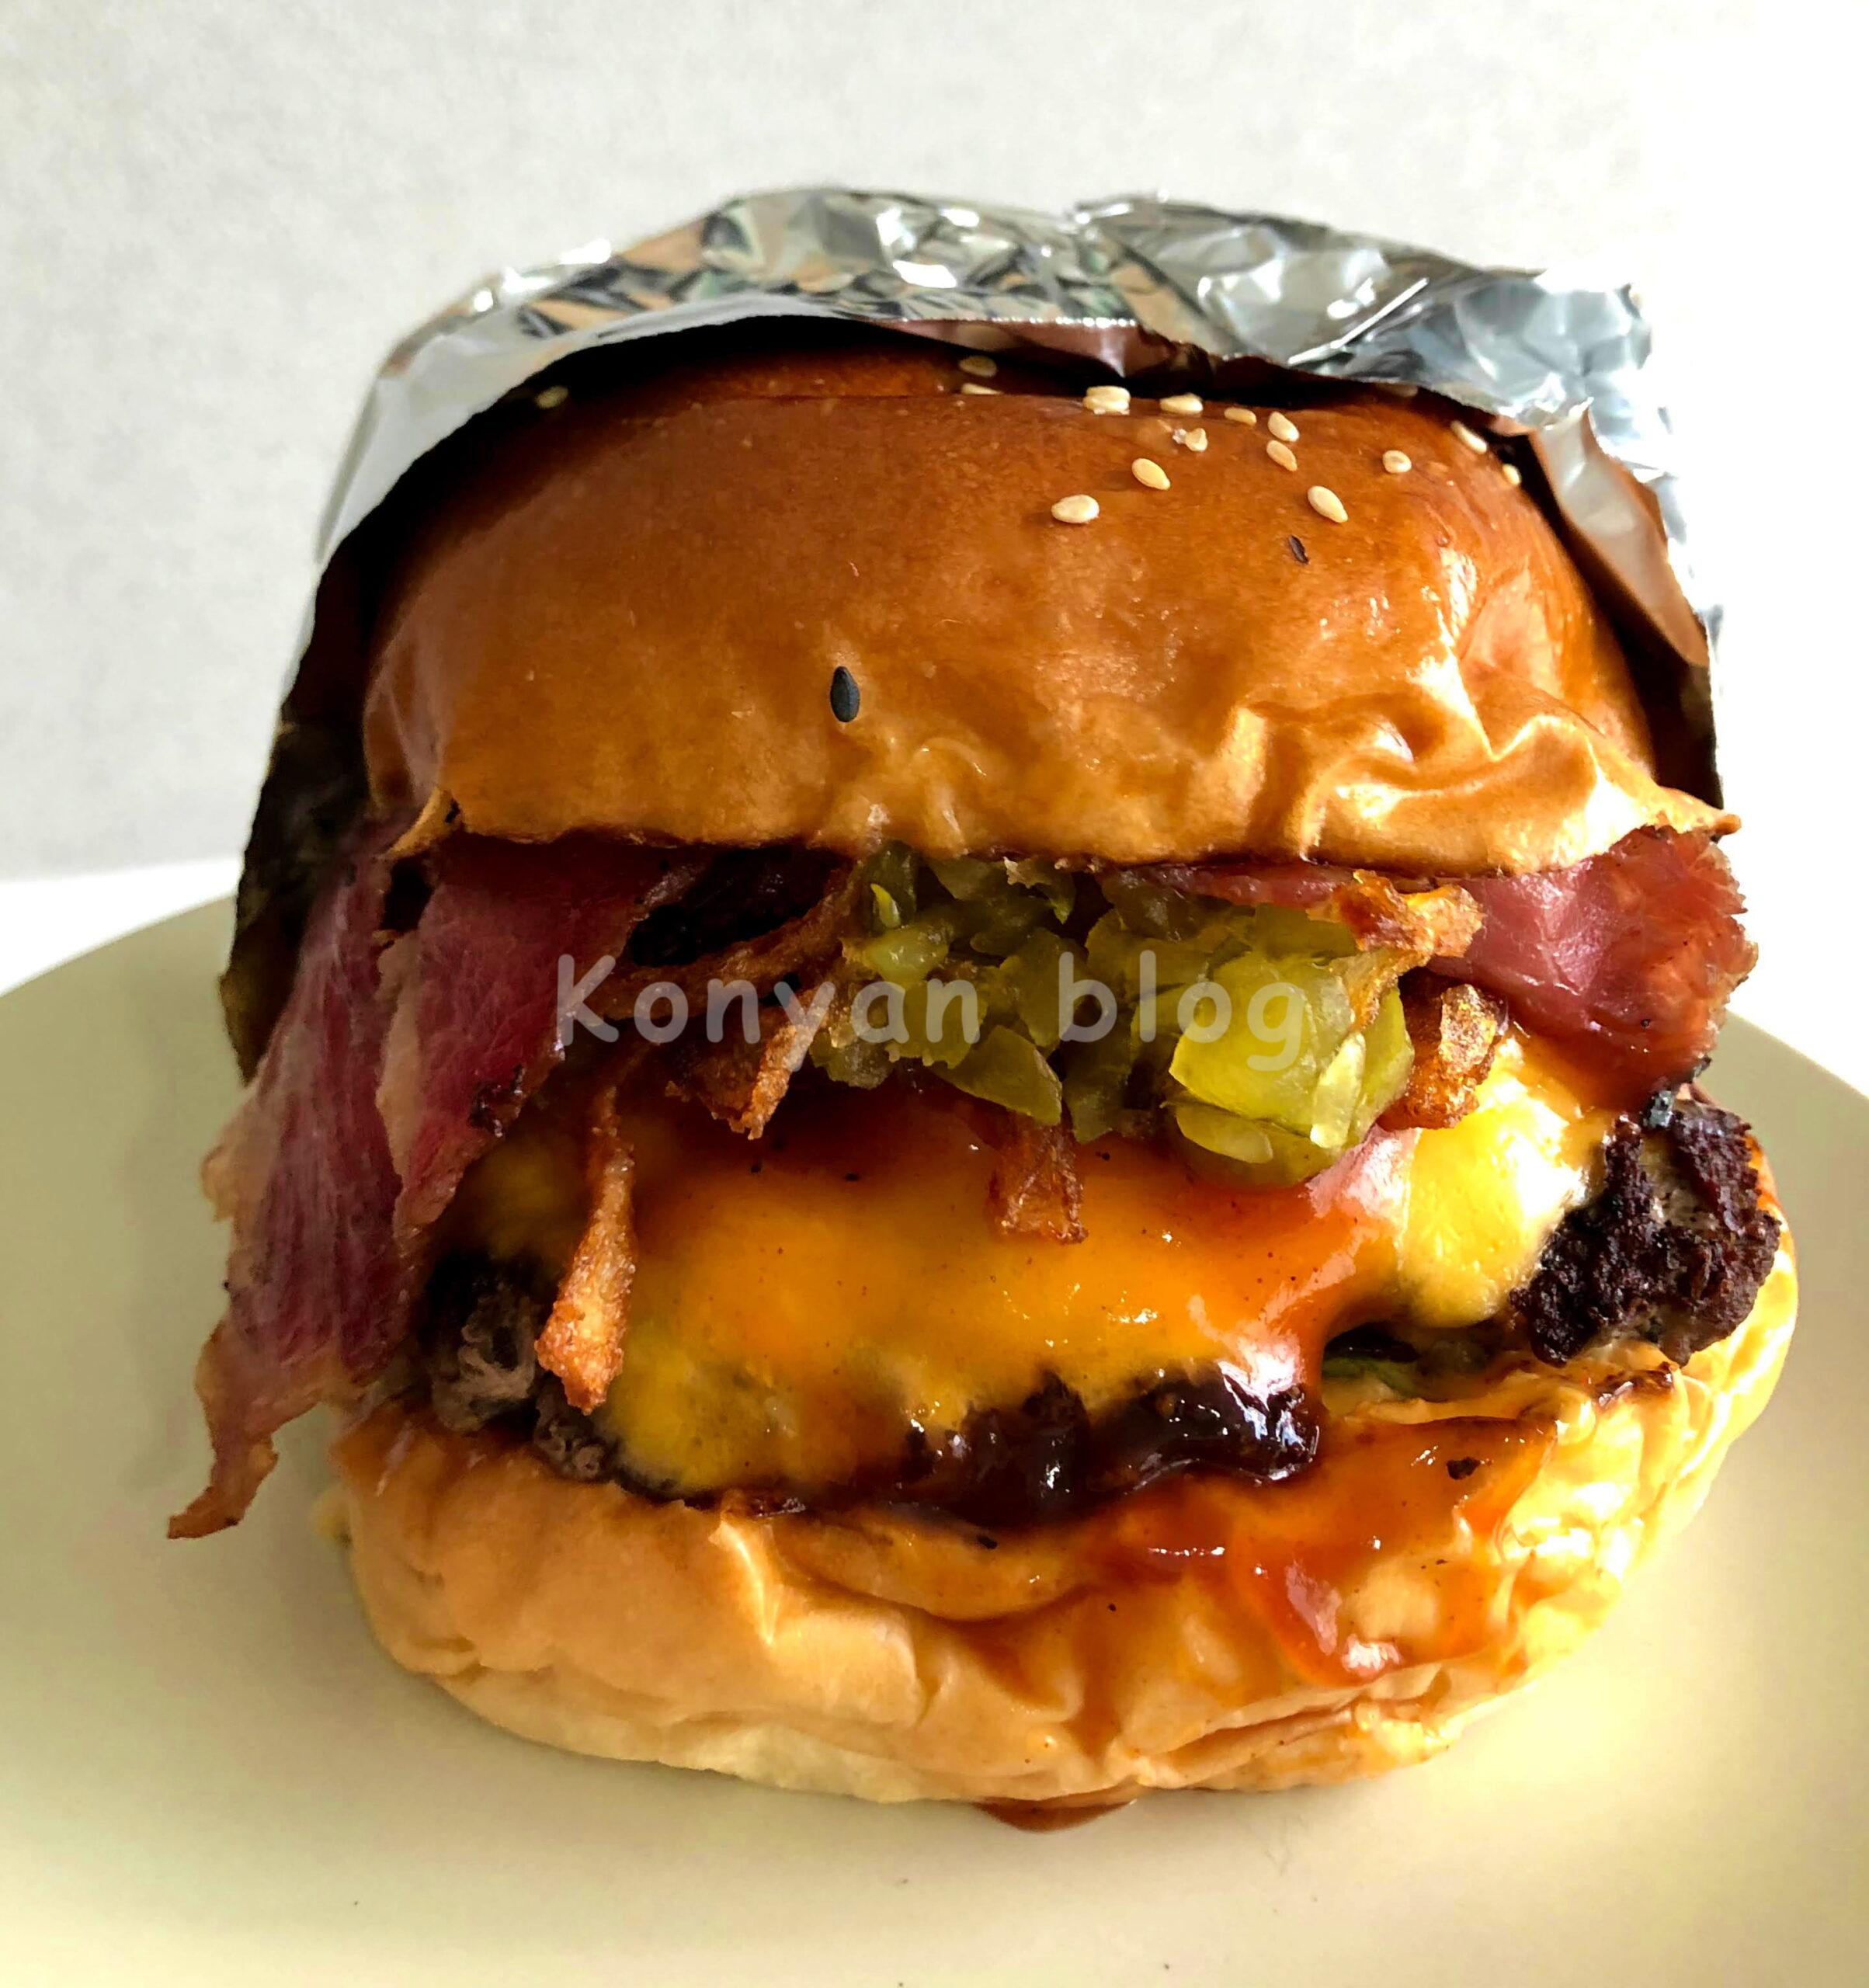 firewoodKL hamburger take away